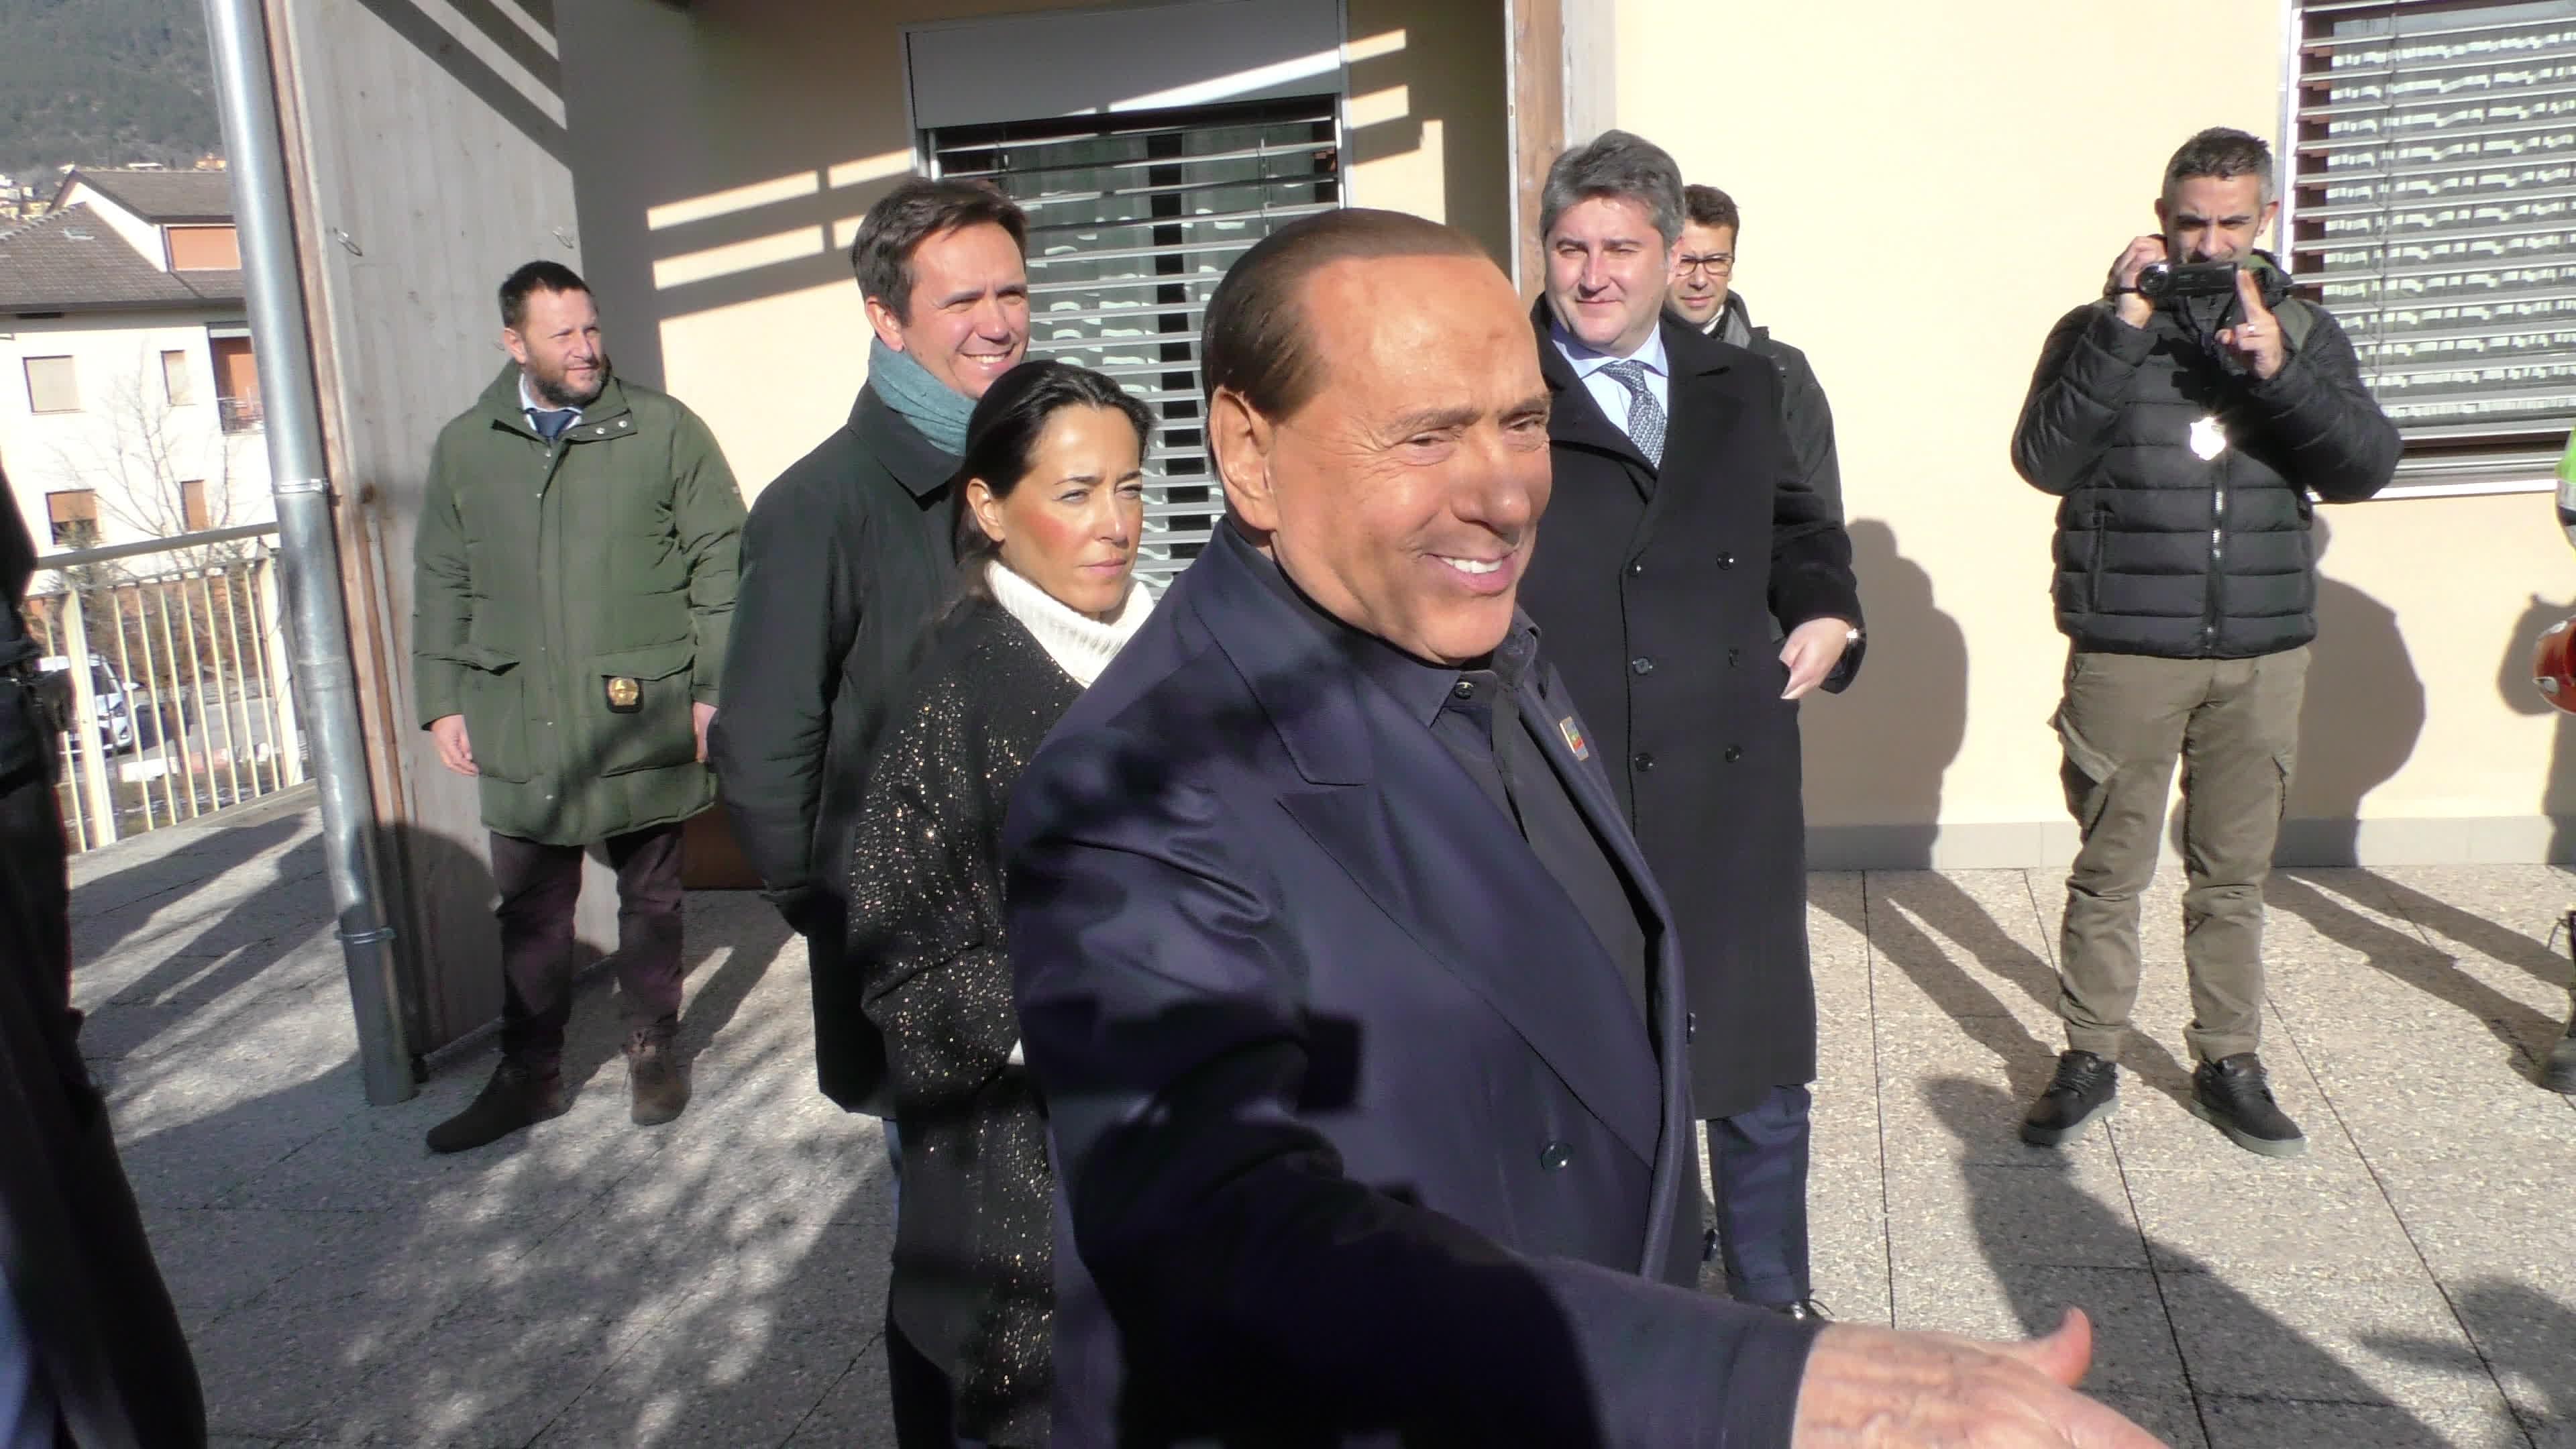 Silvio Berlusconi Visits L'Aquila